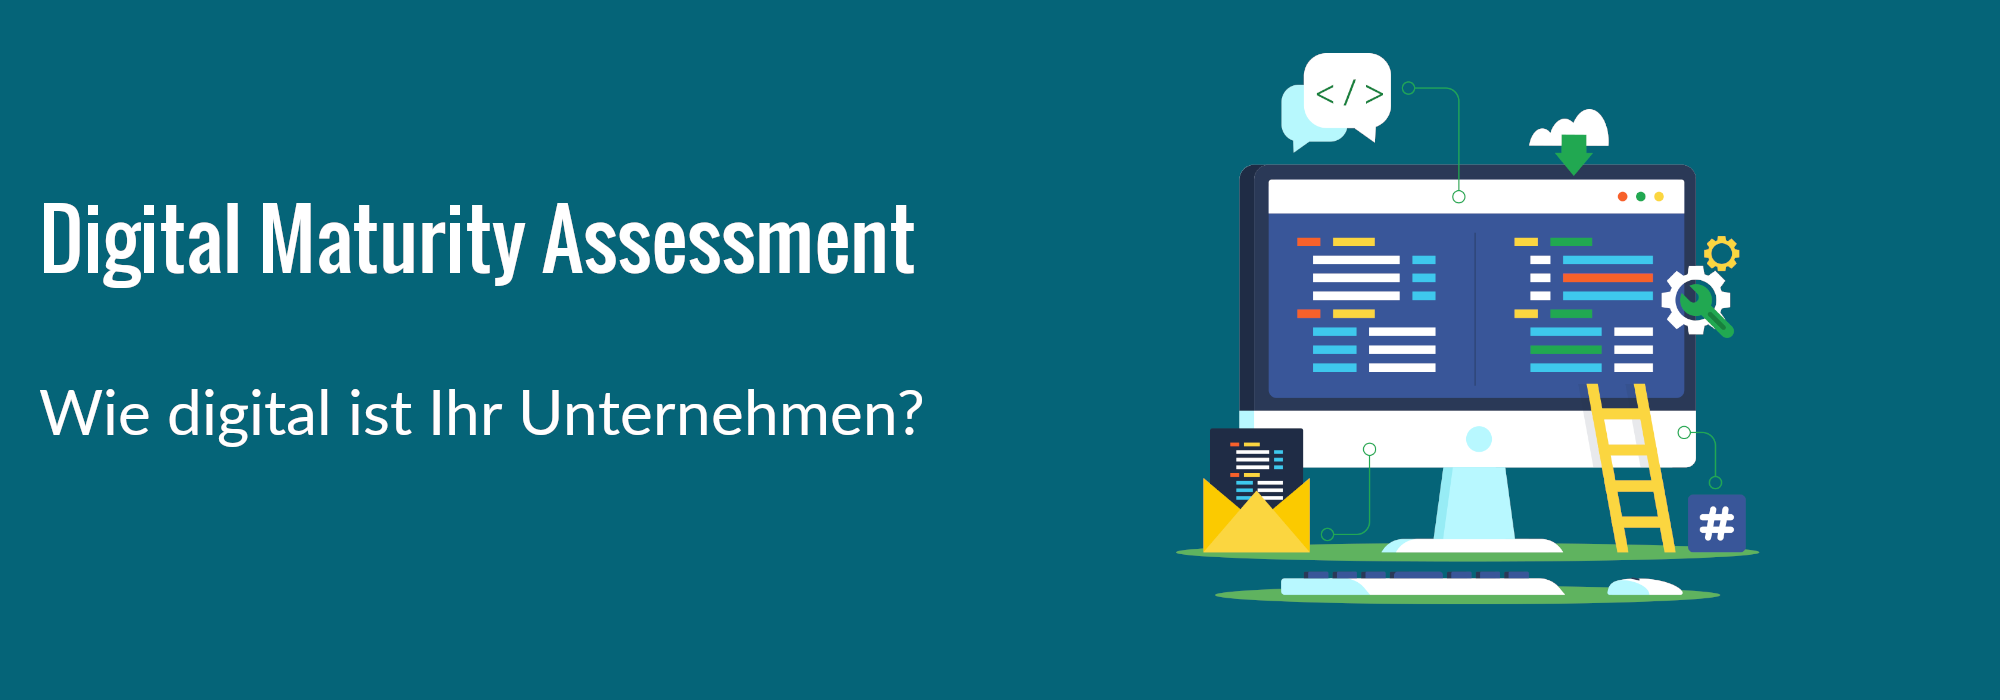 d115f401491b Digital Maturity Assessment – Wie digital ist Ihr Unternehmen